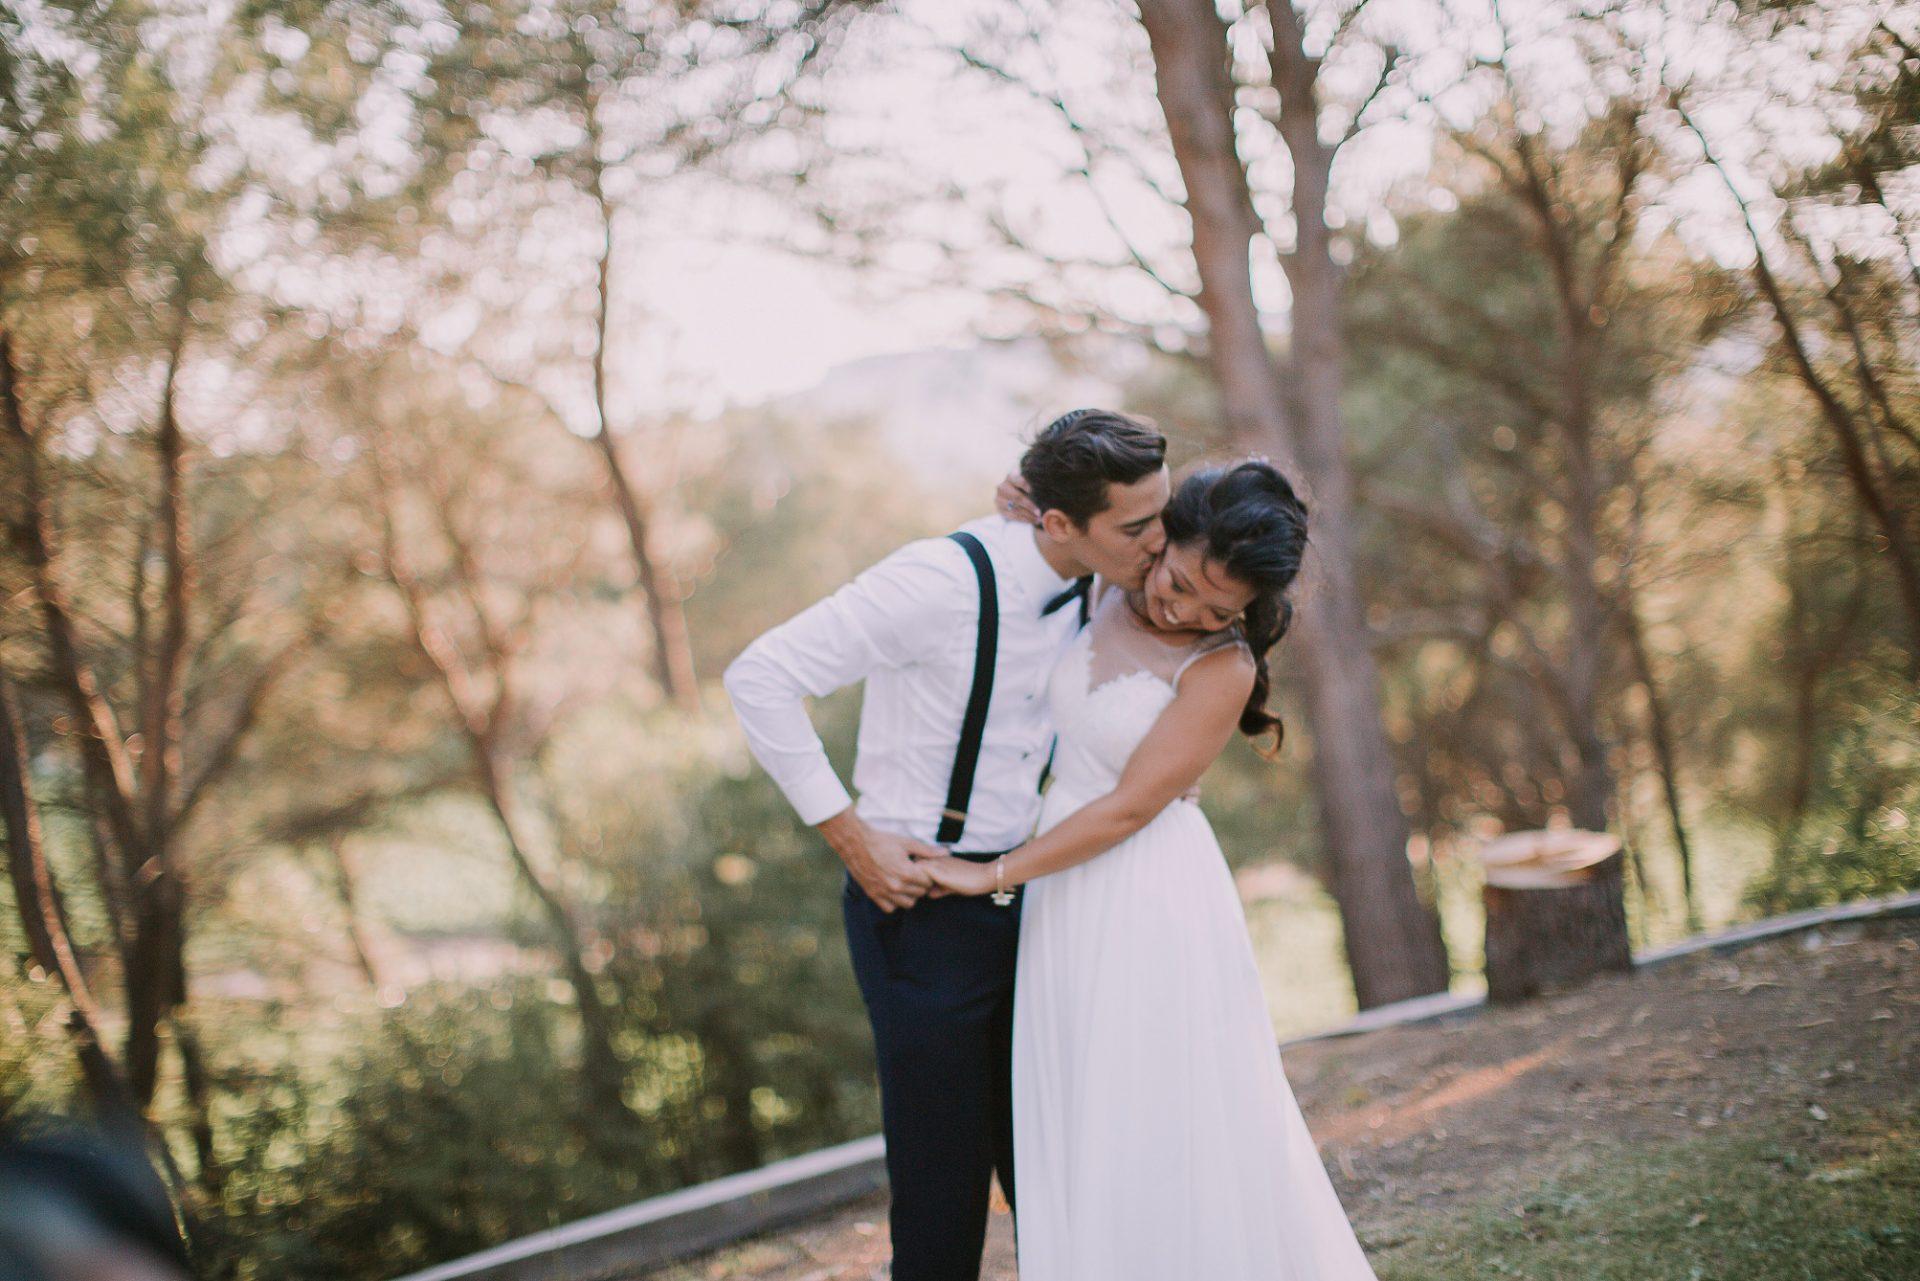 katerynaphotos-mariage-photographe-puyloubier-provence-aix-en-provence-sud-de-la-france_0441.jpg